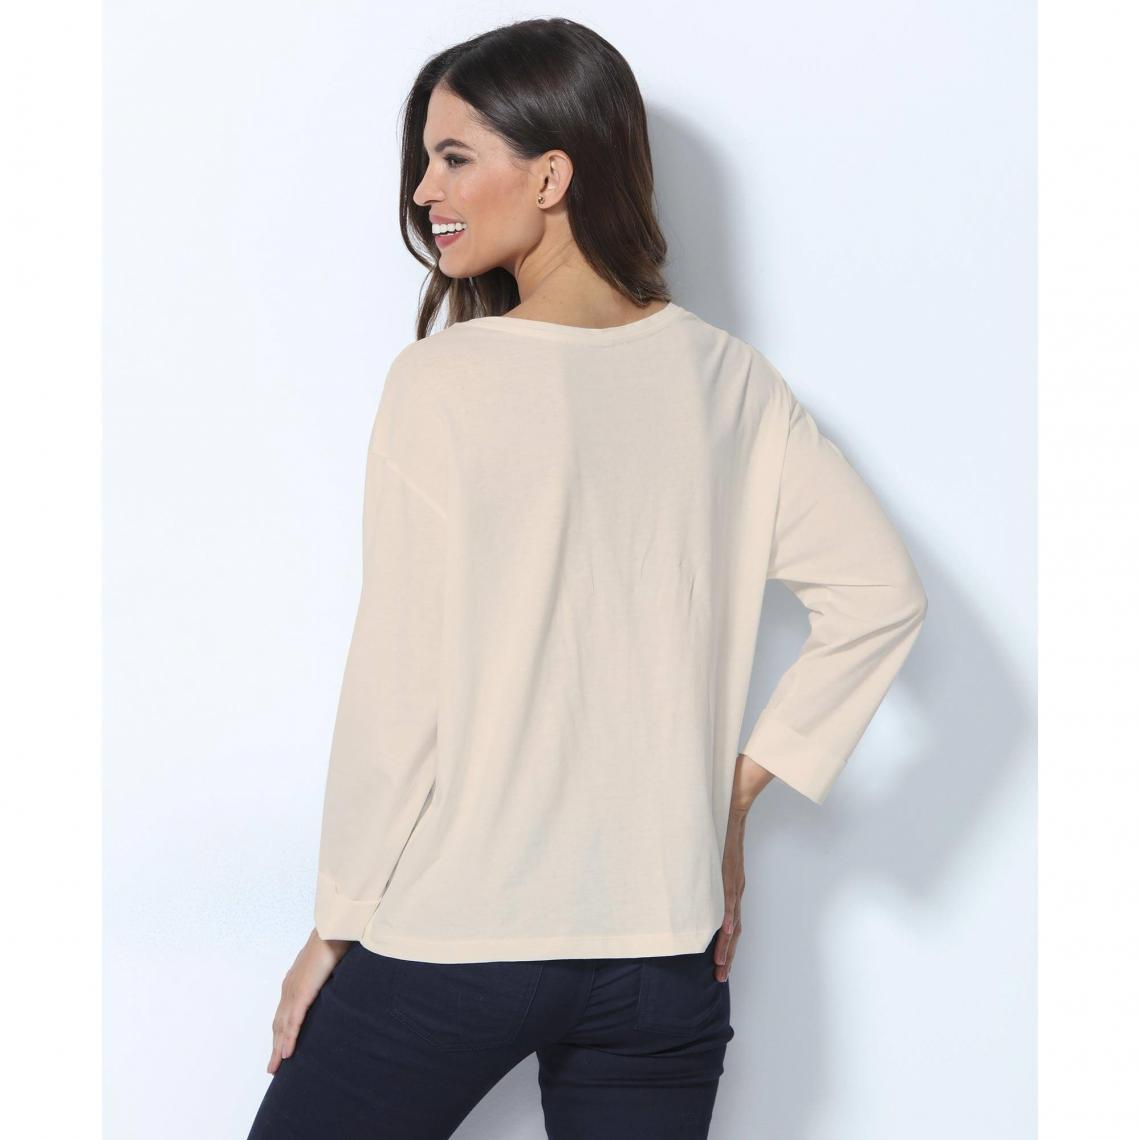 d8321857fbc Tee shirt manches longues femme - Blanc